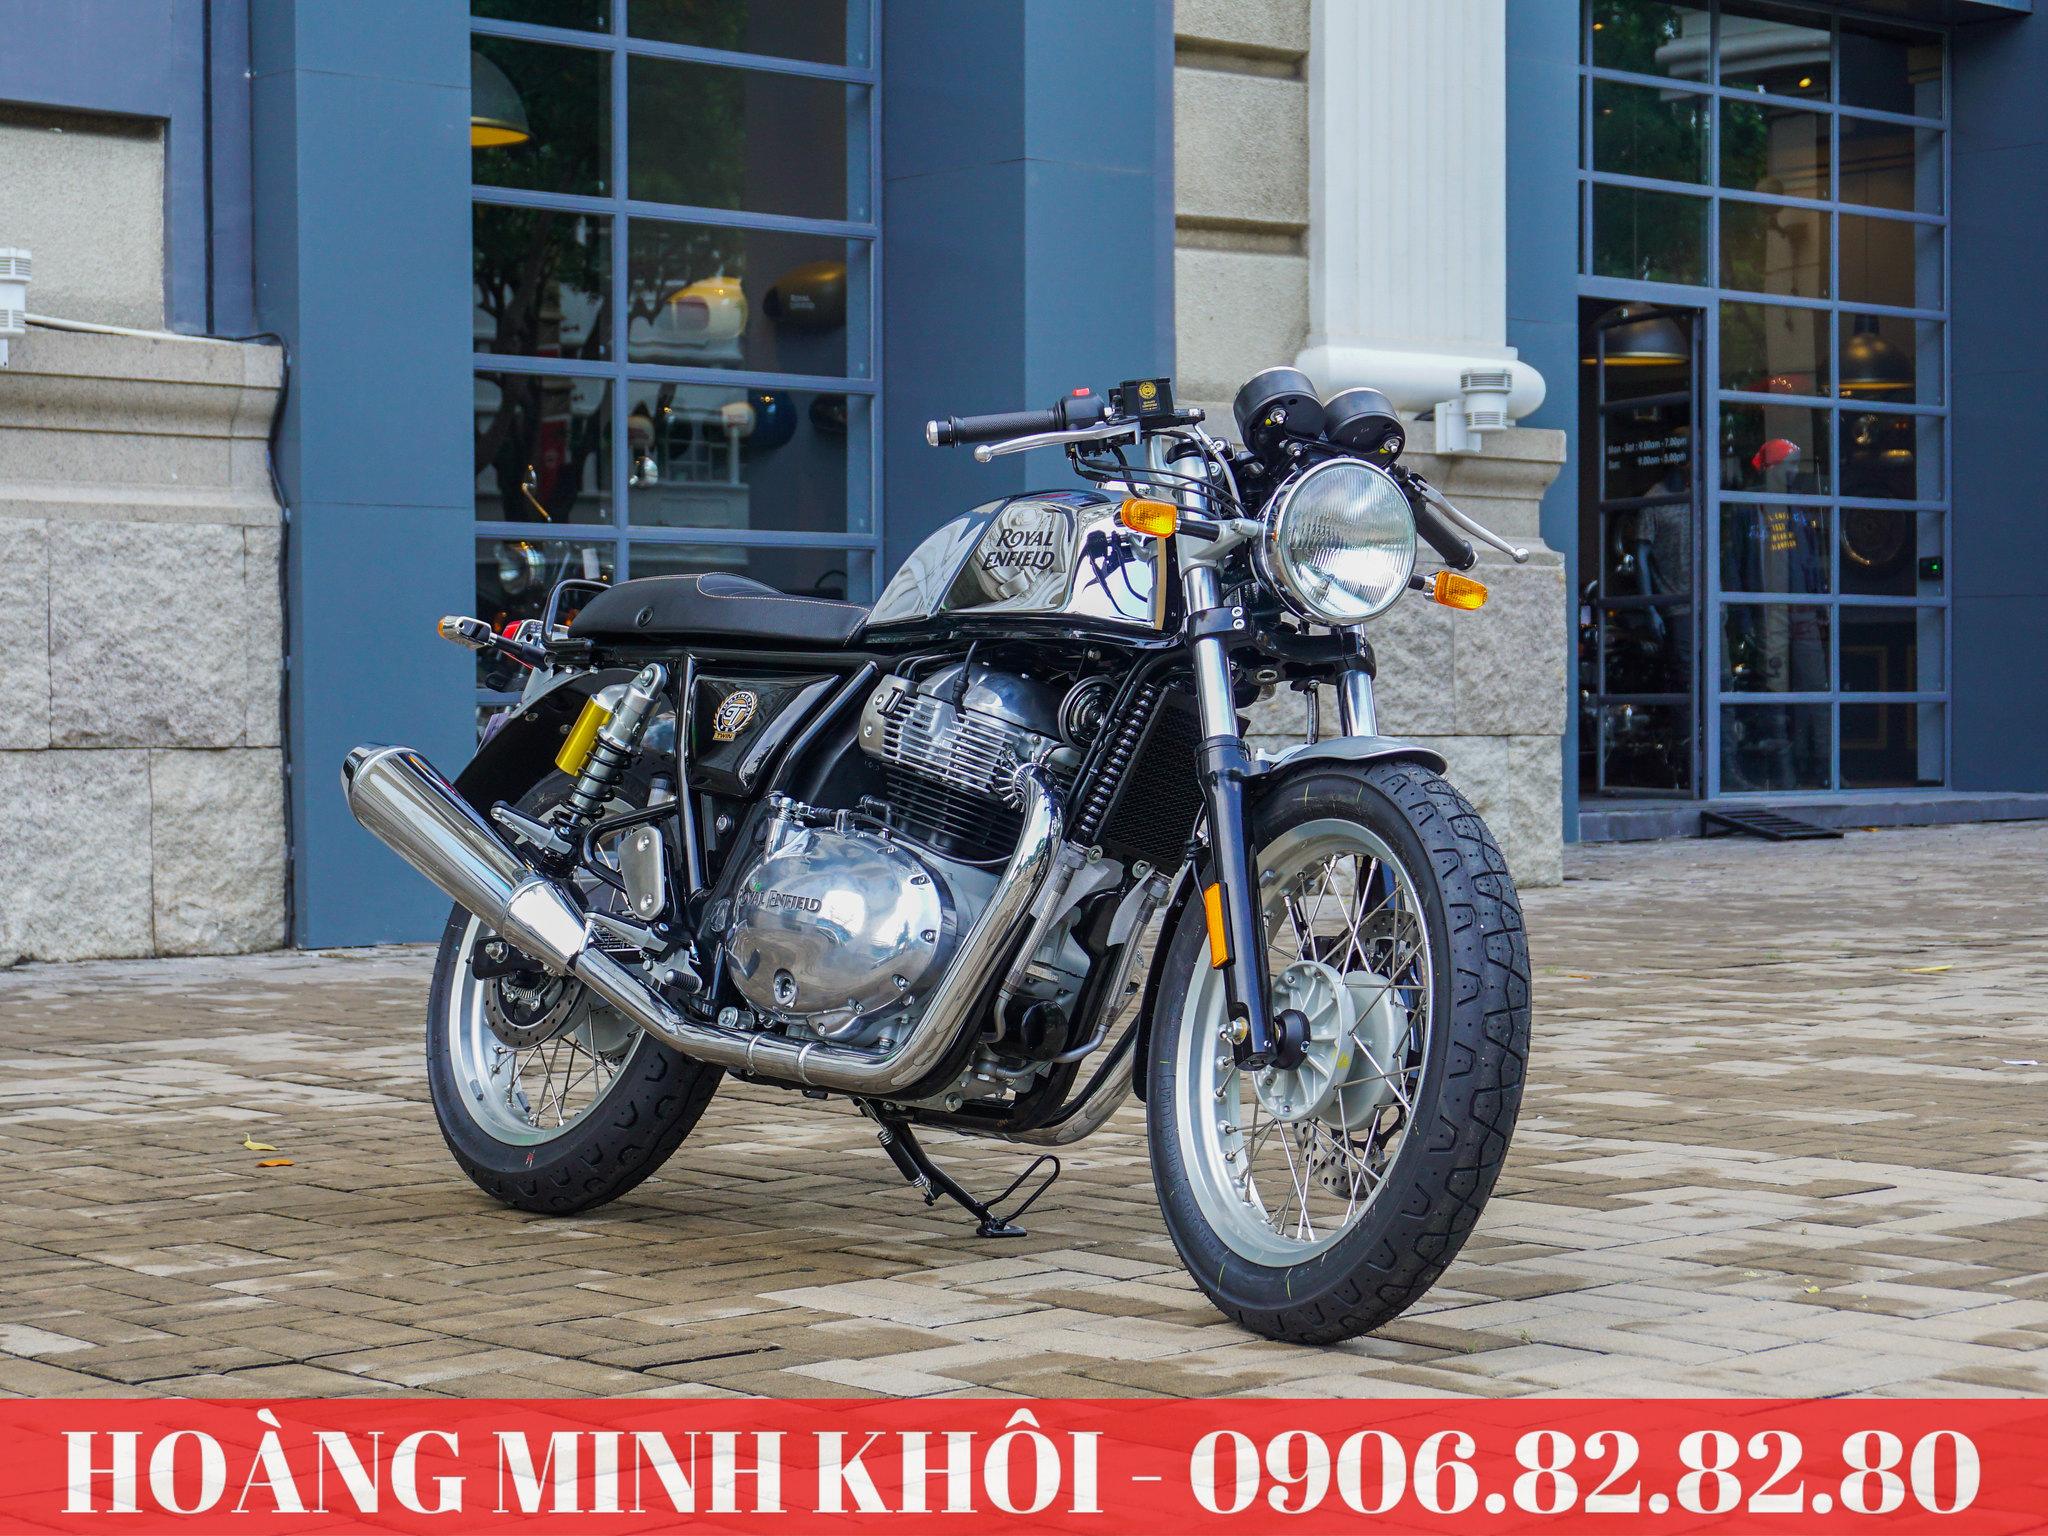 Xe Motor Royal Enfield Continental GT 650 Mister Clean Viet Nam Vietnam Ho Chi Minh Quan 7 7